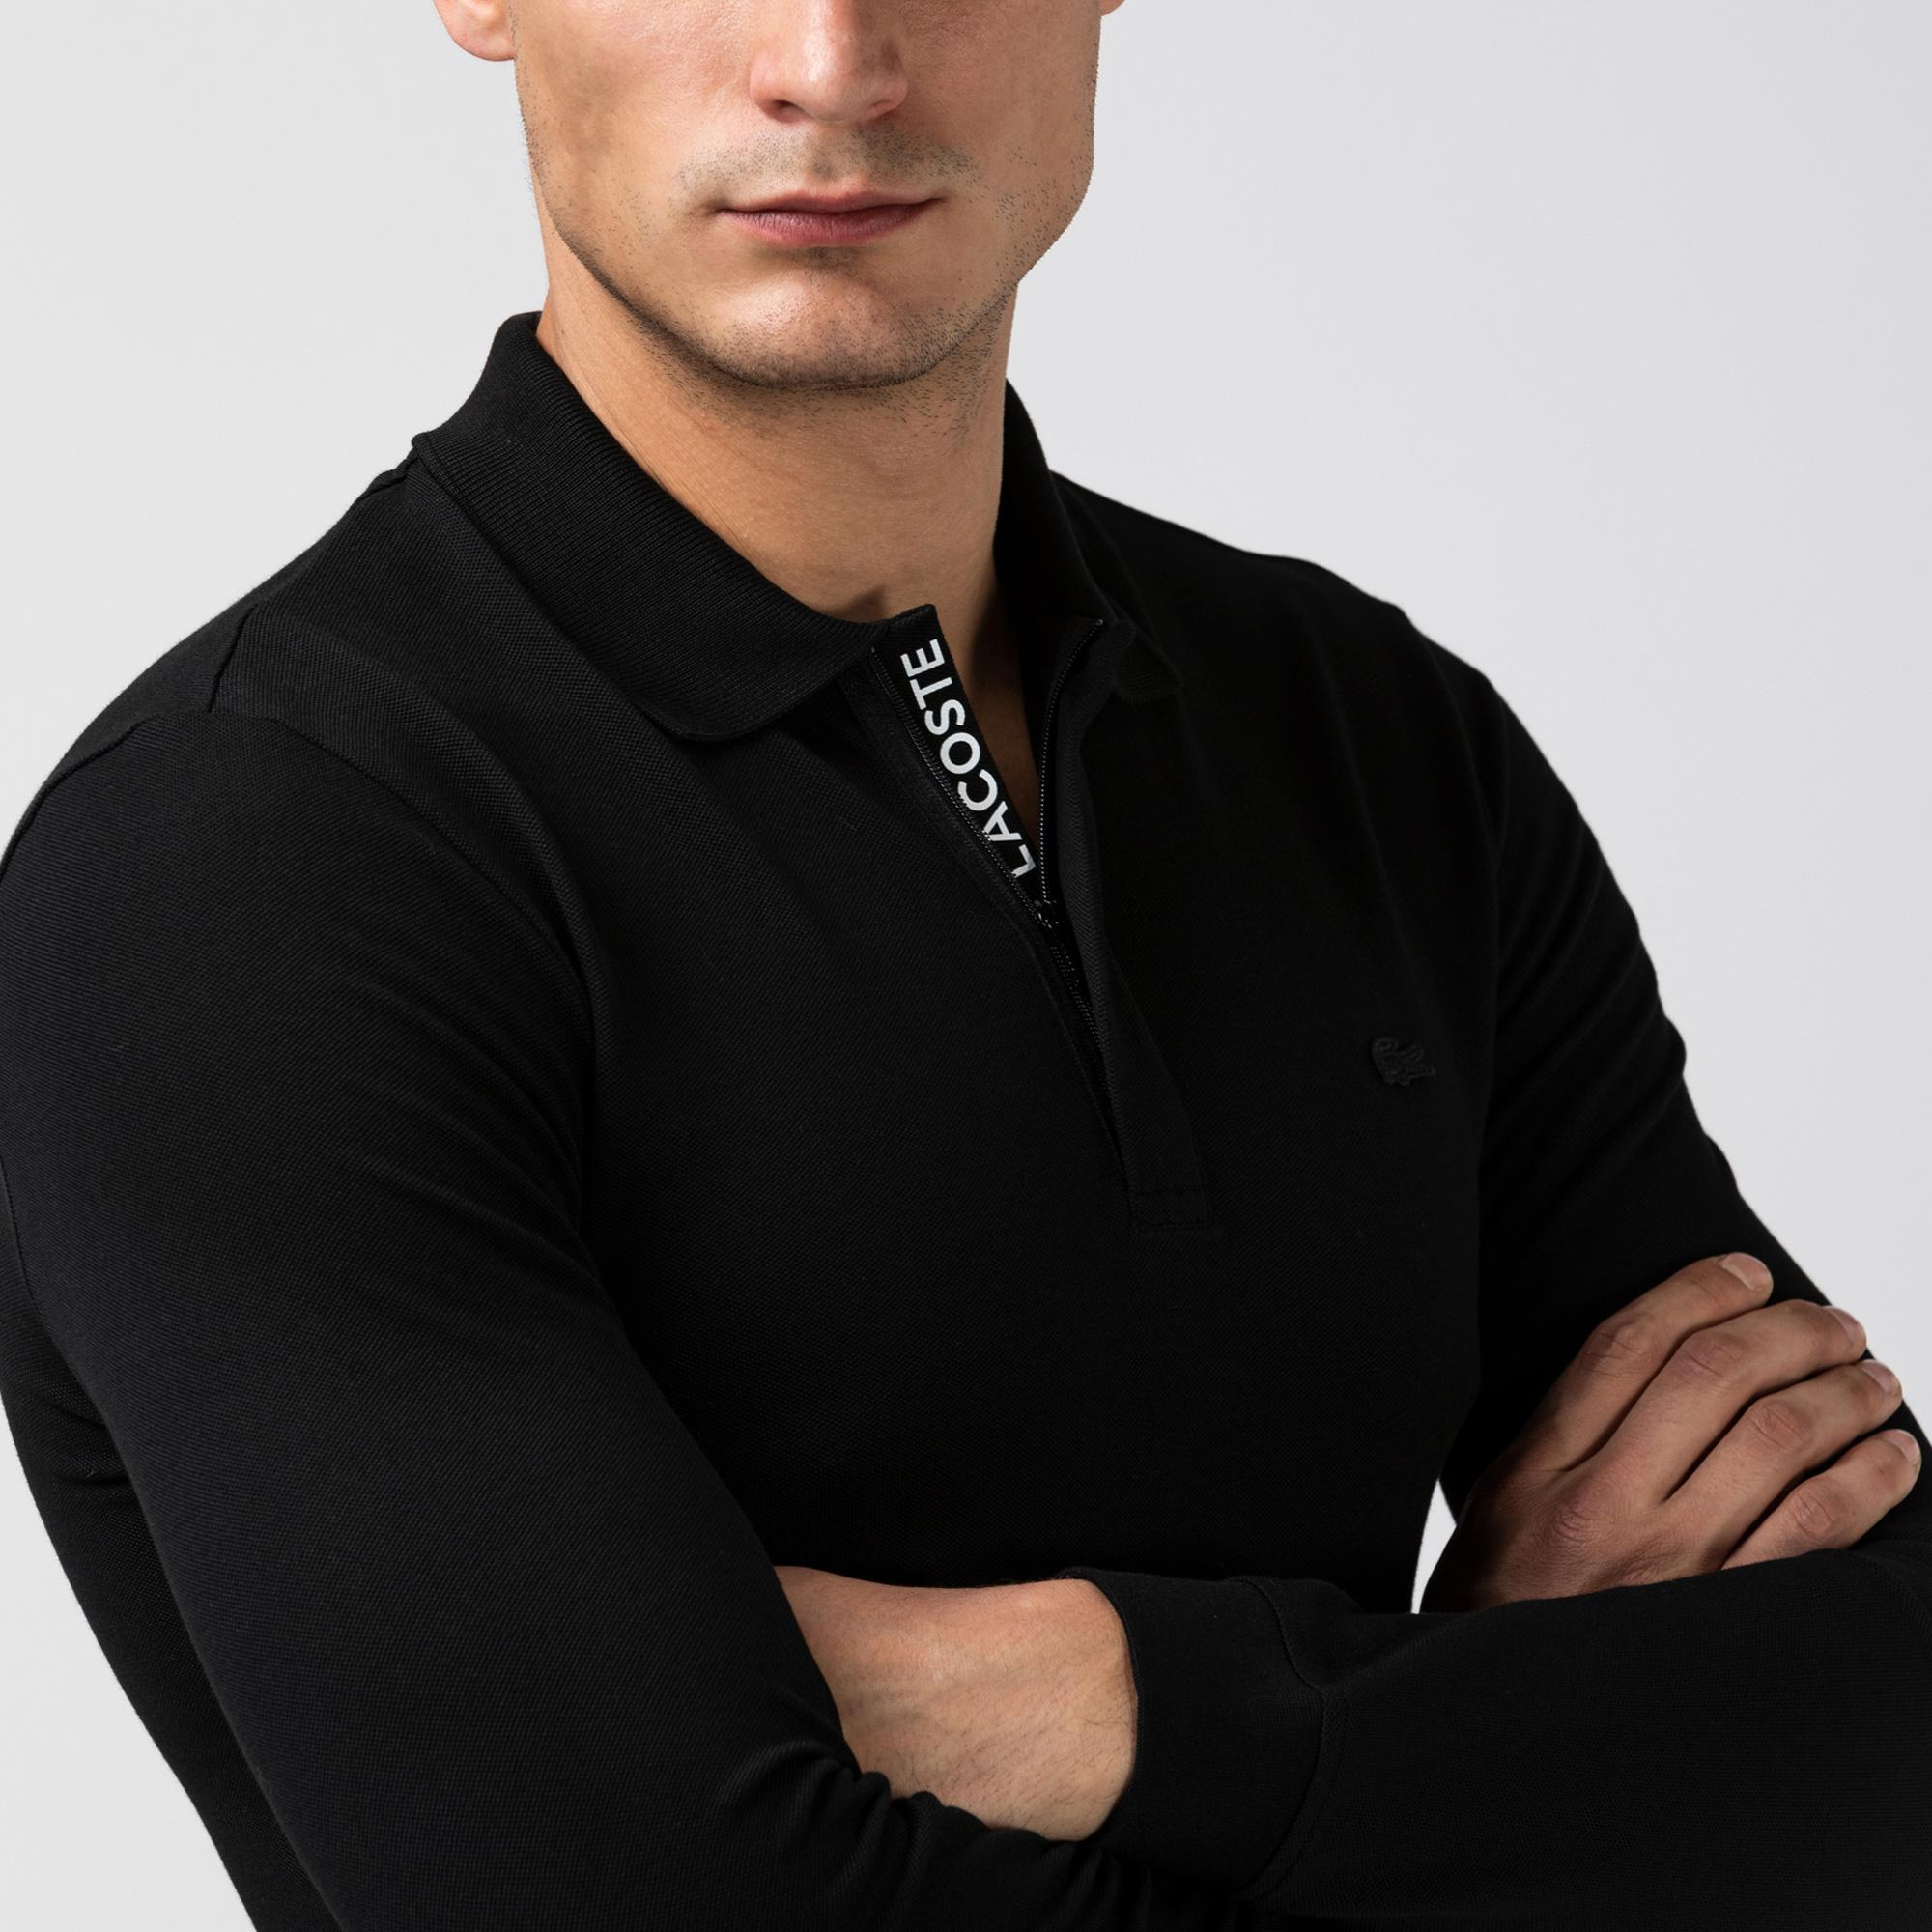 Lacoste Erkek Slim Fit Fermuar Yaka Uzun Kollu Siyah Polo